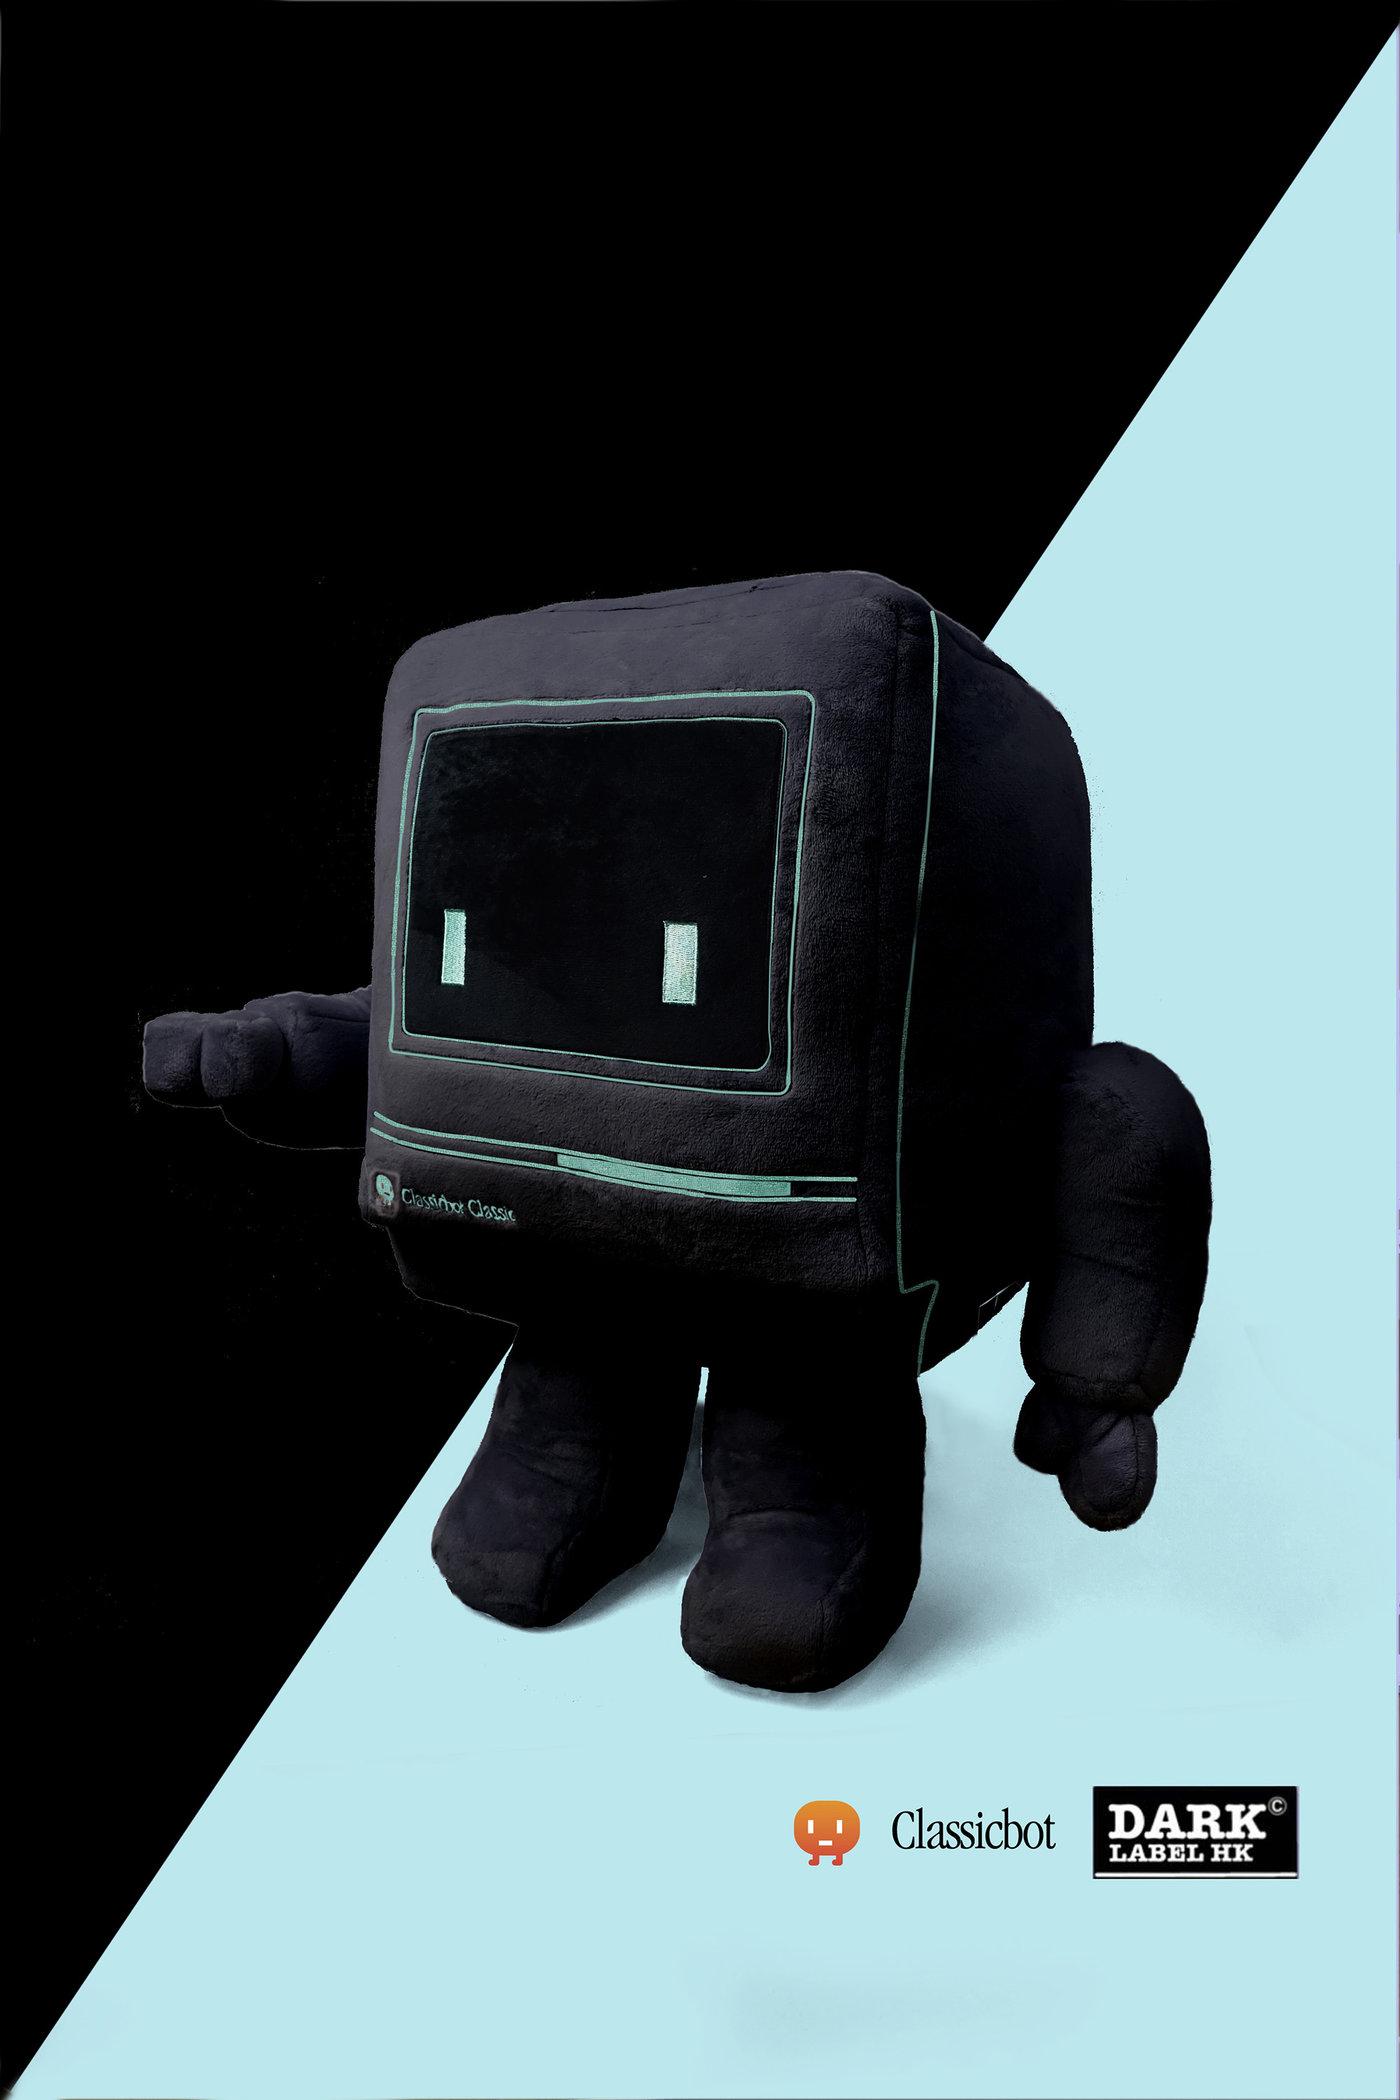 巨大布偶Classicbot Classic